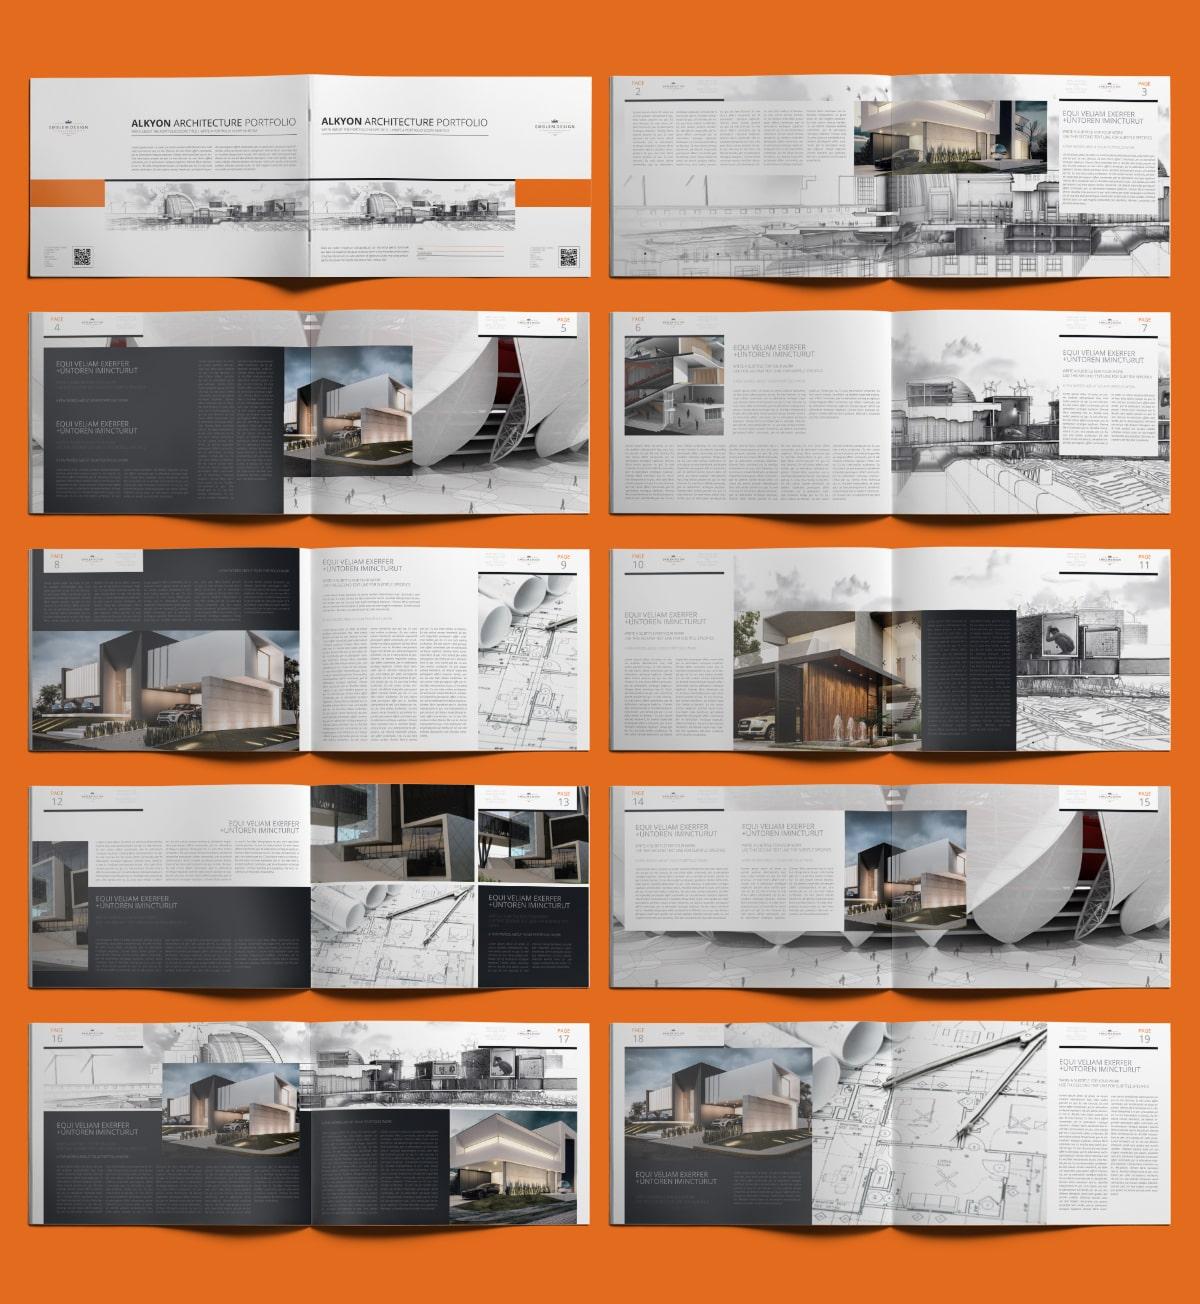 Alkyon Architecture Portfolio A4 Landscape - Layouts